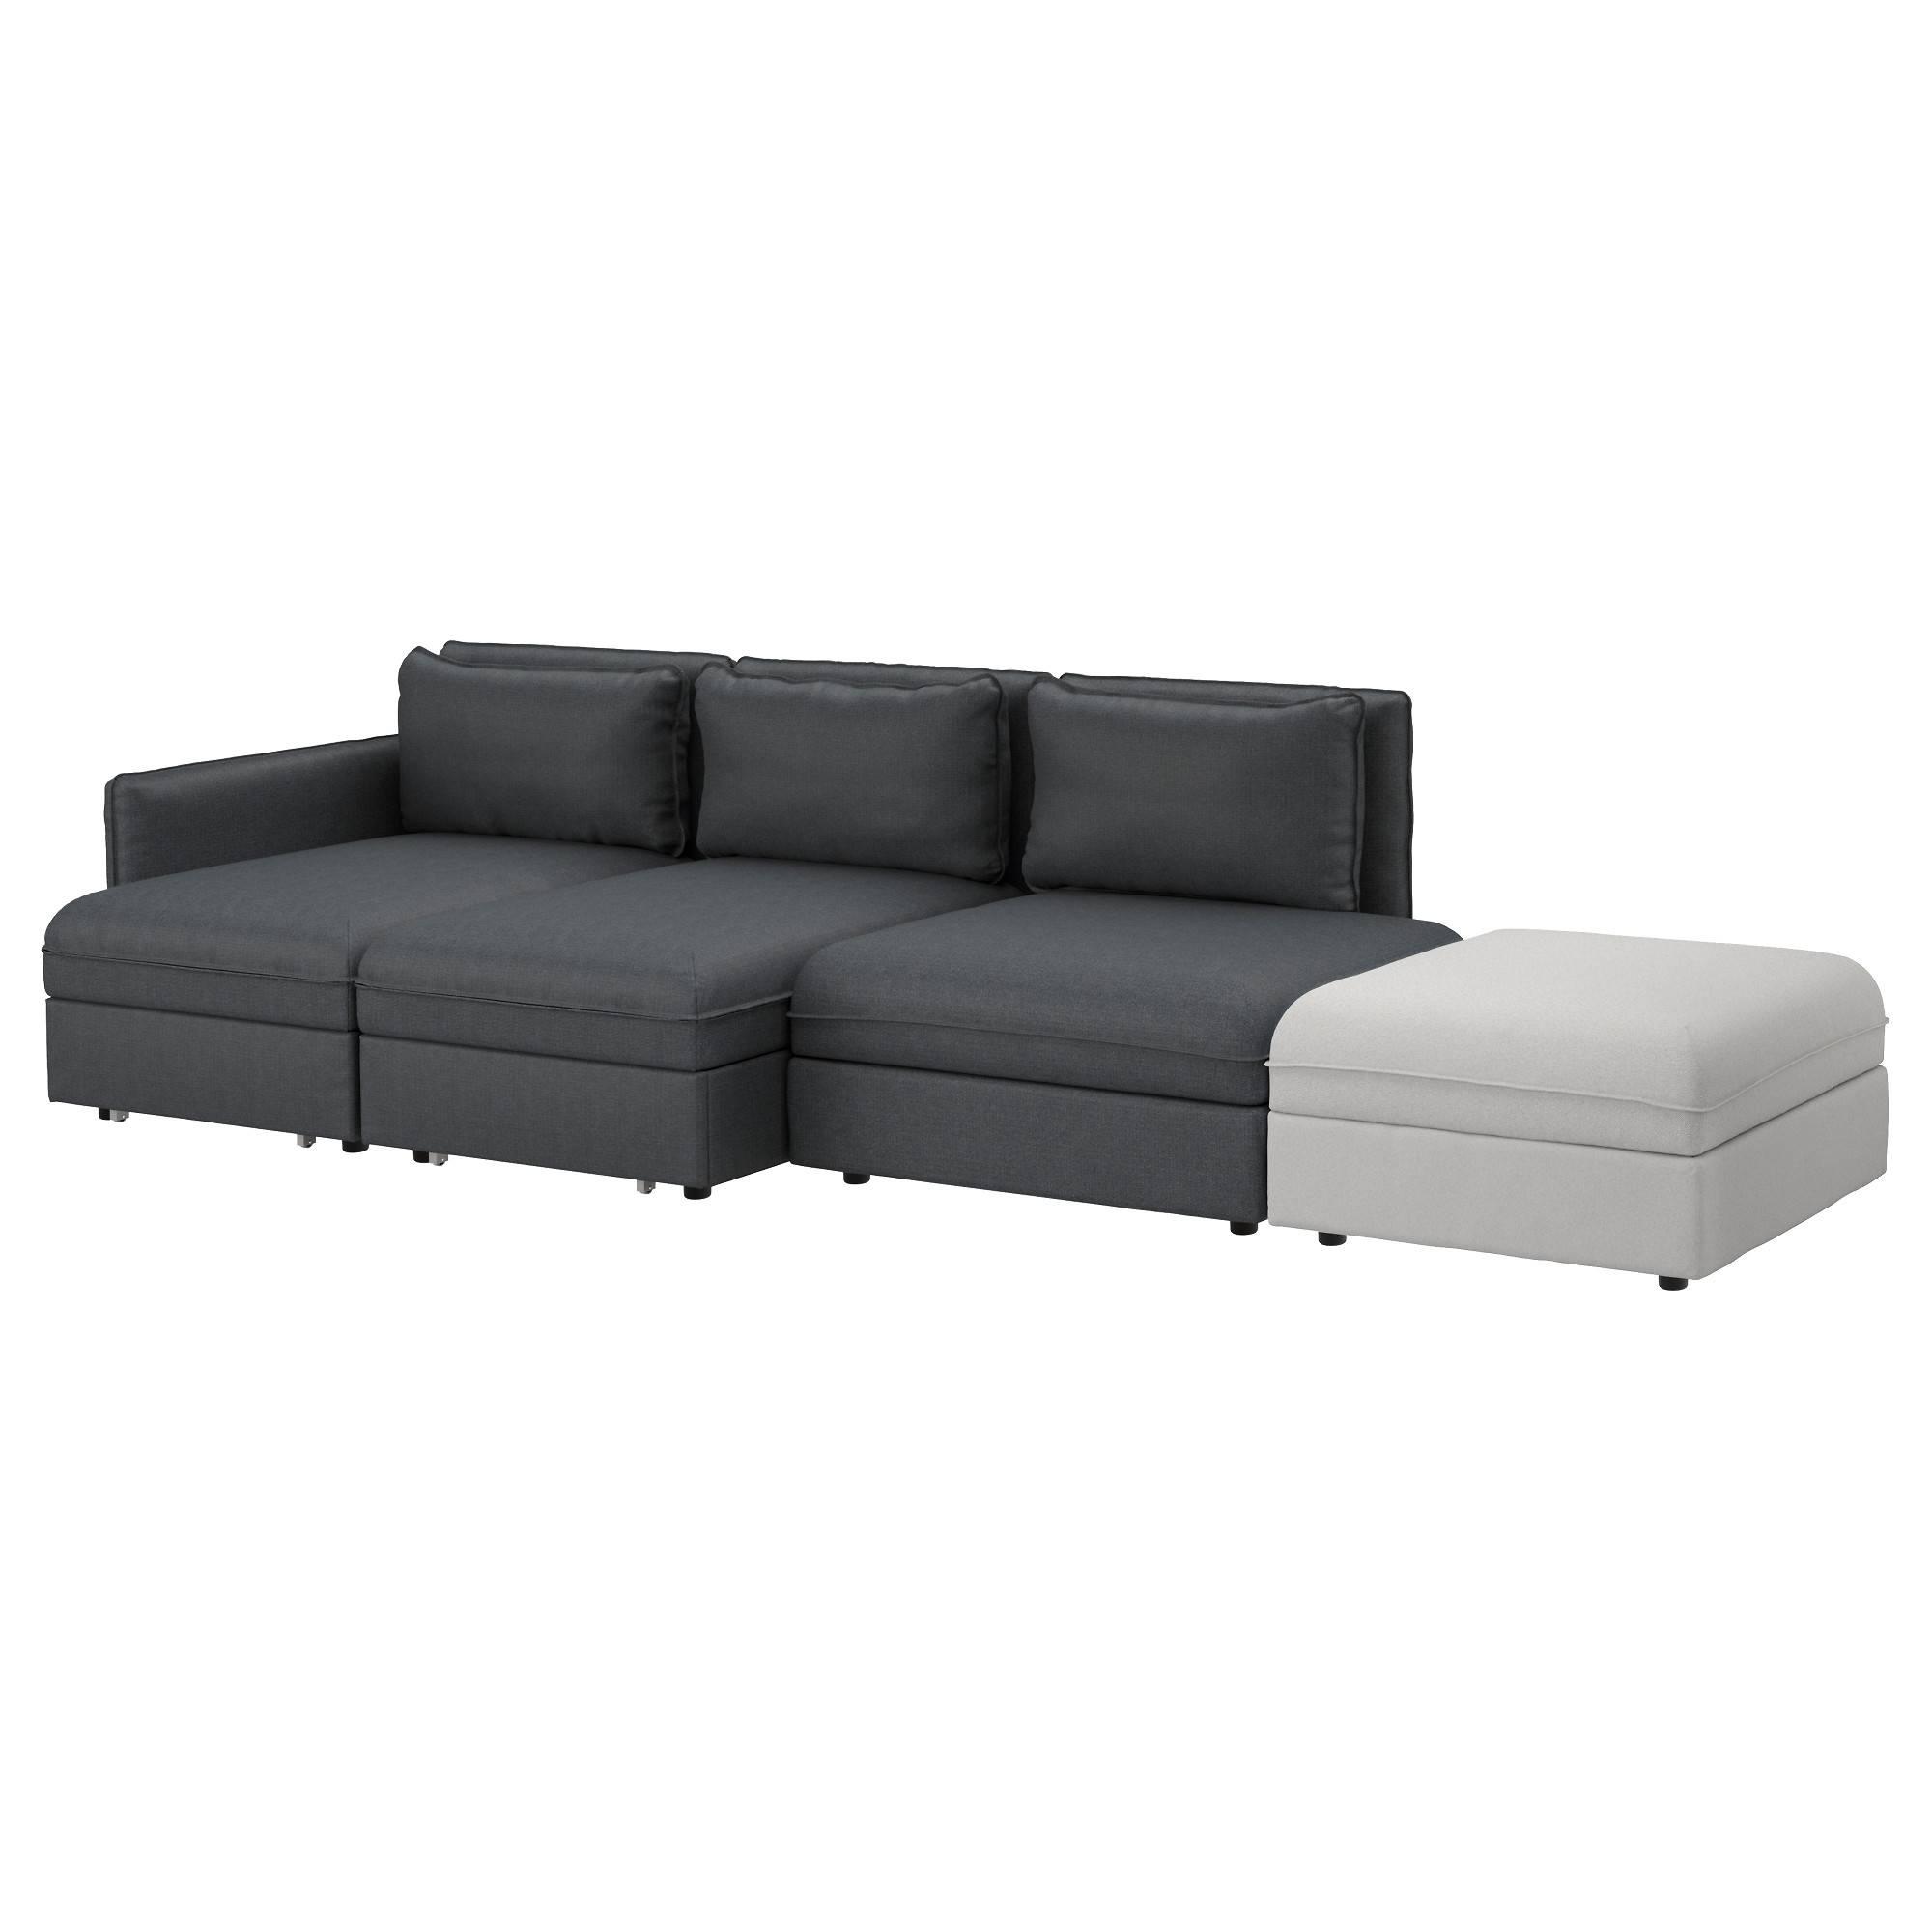 Sofa Beds & Futons - Ikea with regard to Sectional Sofa Beds (Image 20 of 30)